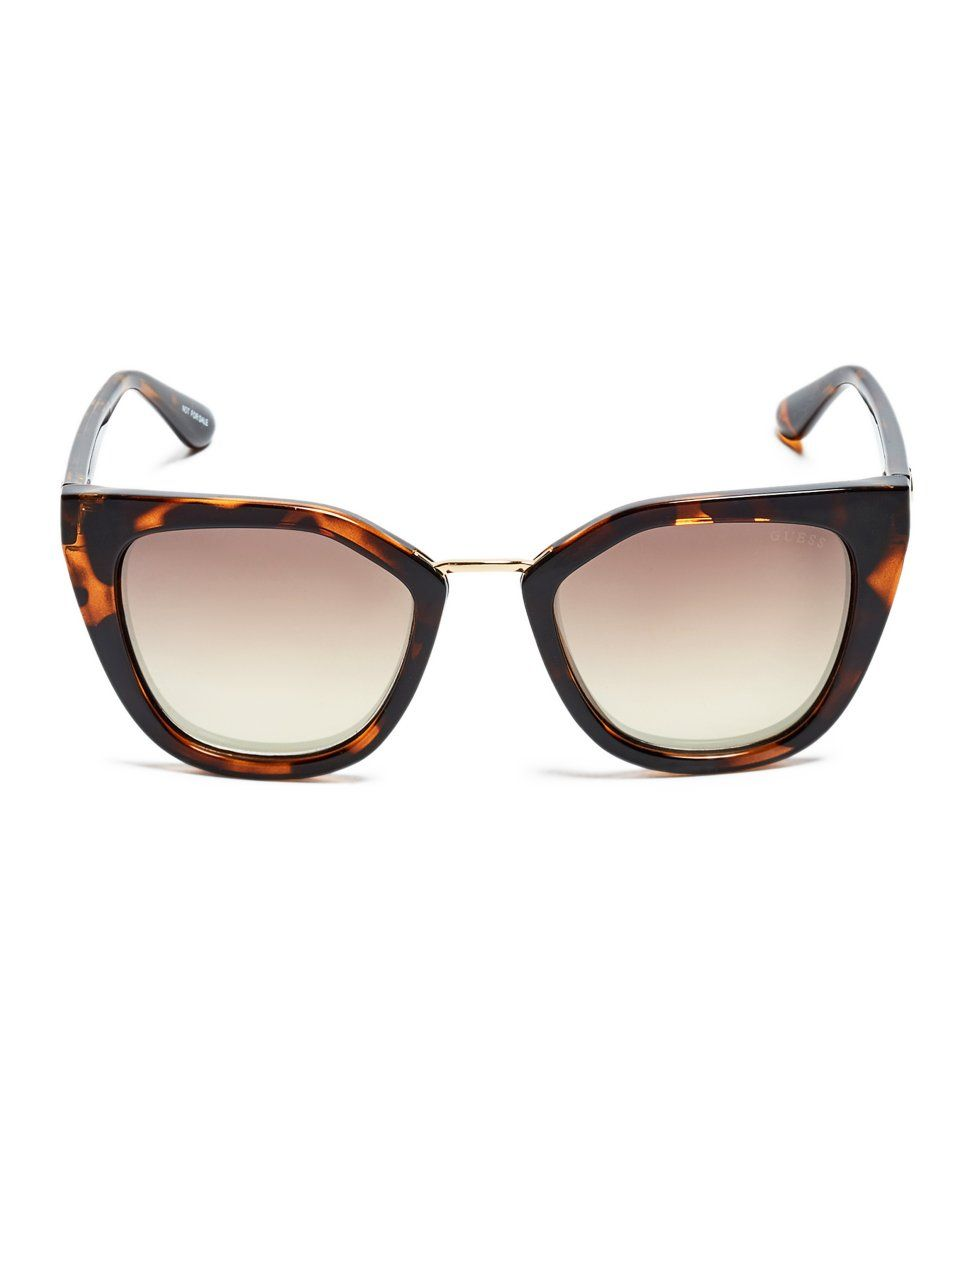 Sunglasses Eye In Sunglasses Cat 2019Products PZuwOiTkXl